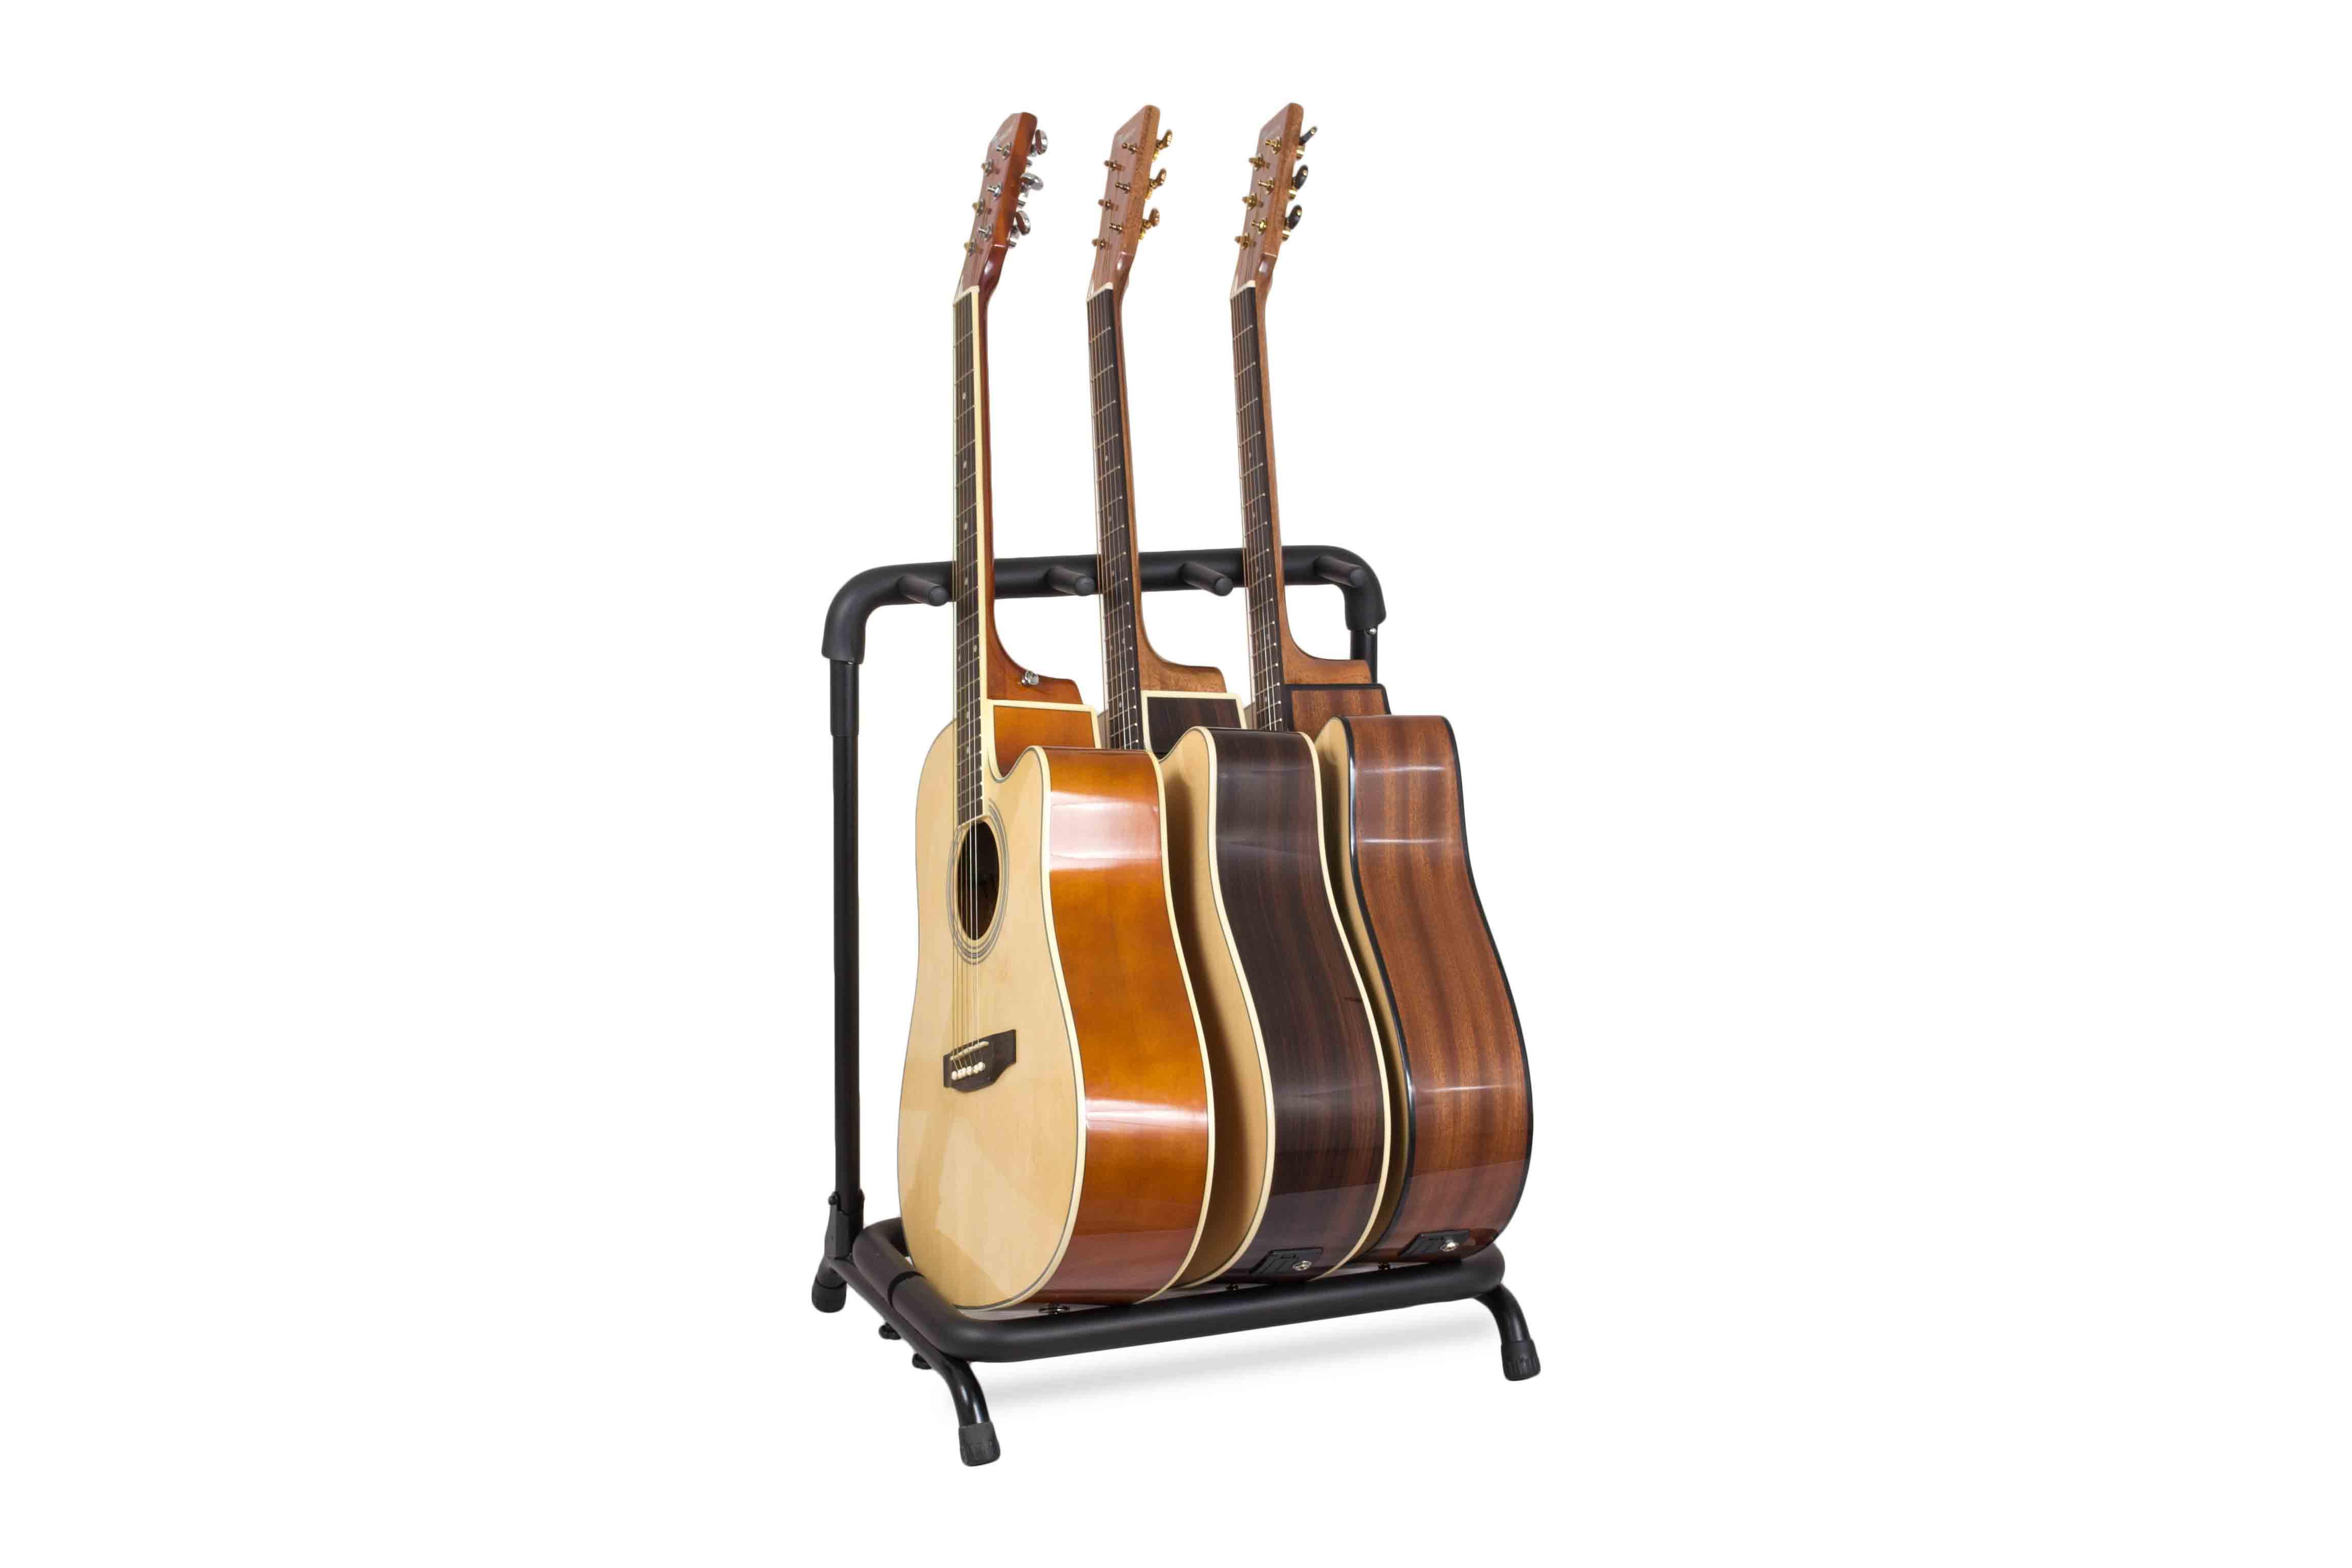 Davis Musical Instruments-JX-73_0